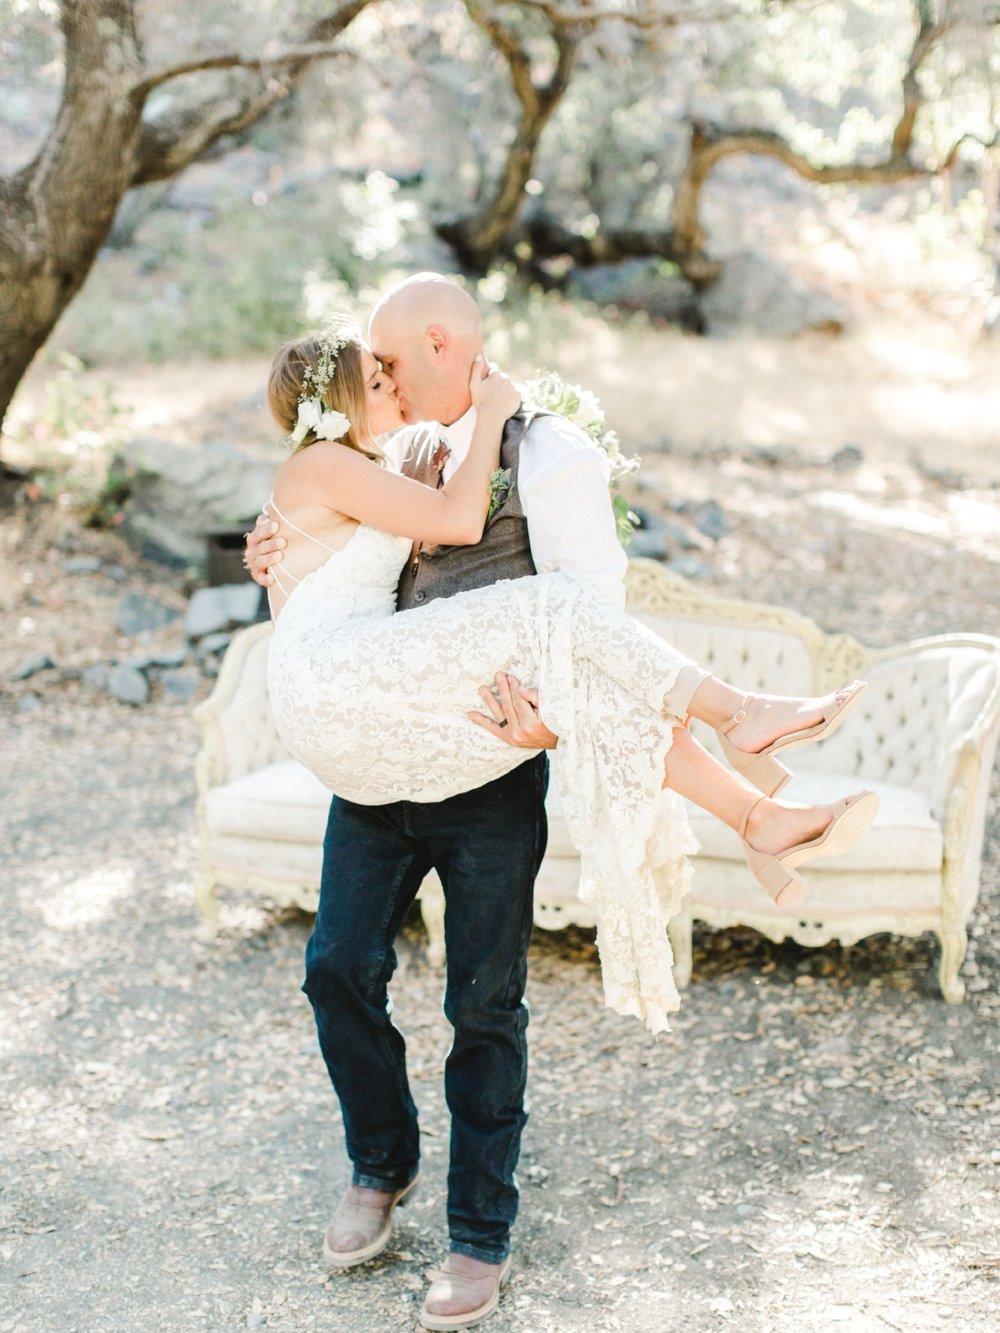 Rhianna-Mercier-Photography-Molly-Tyler-La-Questa-Ranch-Wedding-29221.jpg